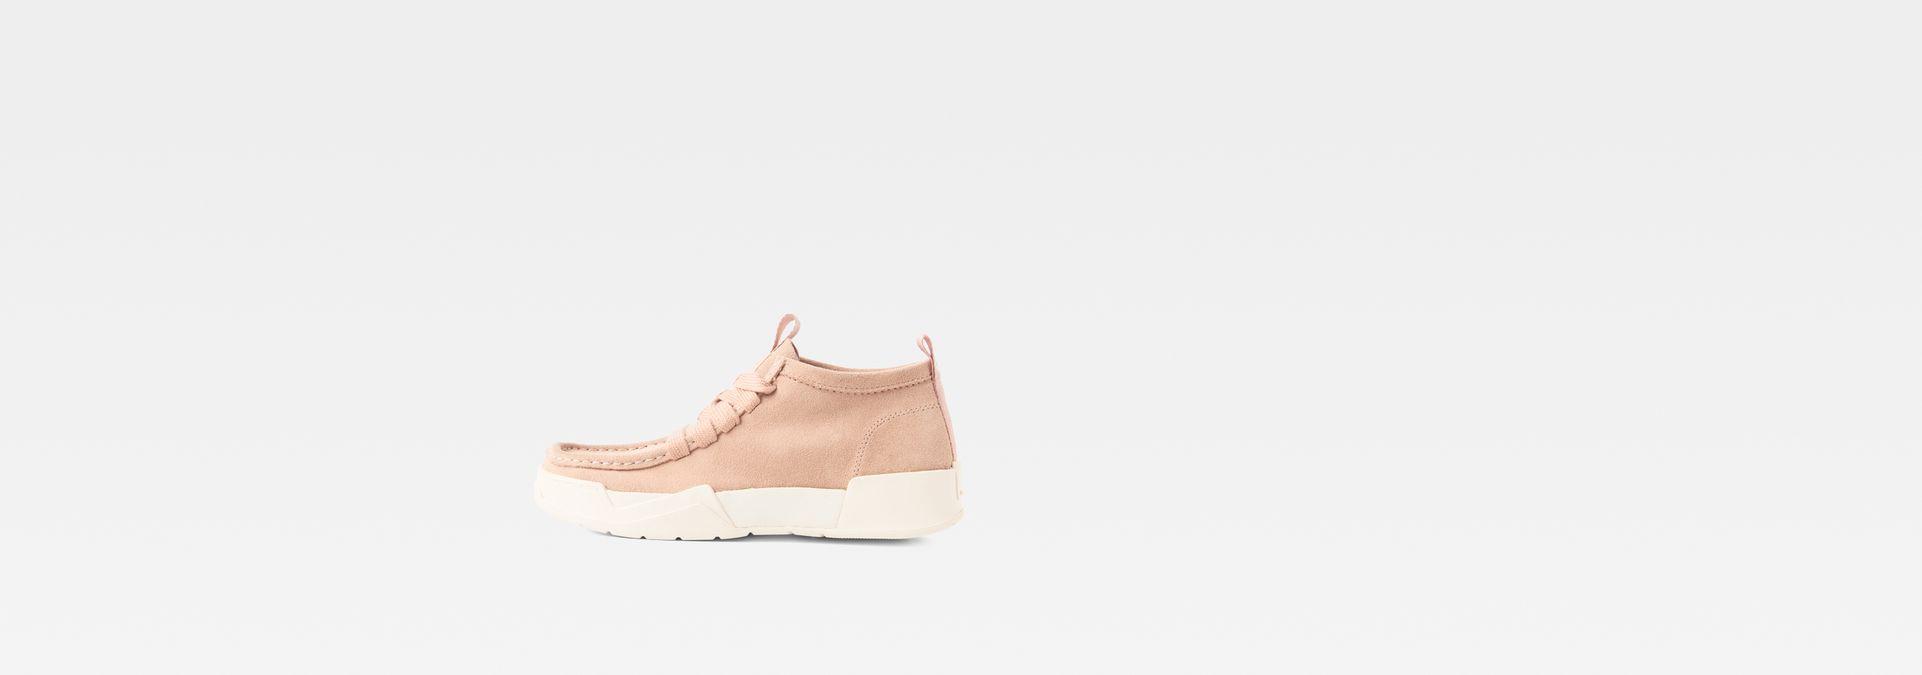 Rackam Wallabee Sport Sneakers | Liquid Pink | G Star RAW®